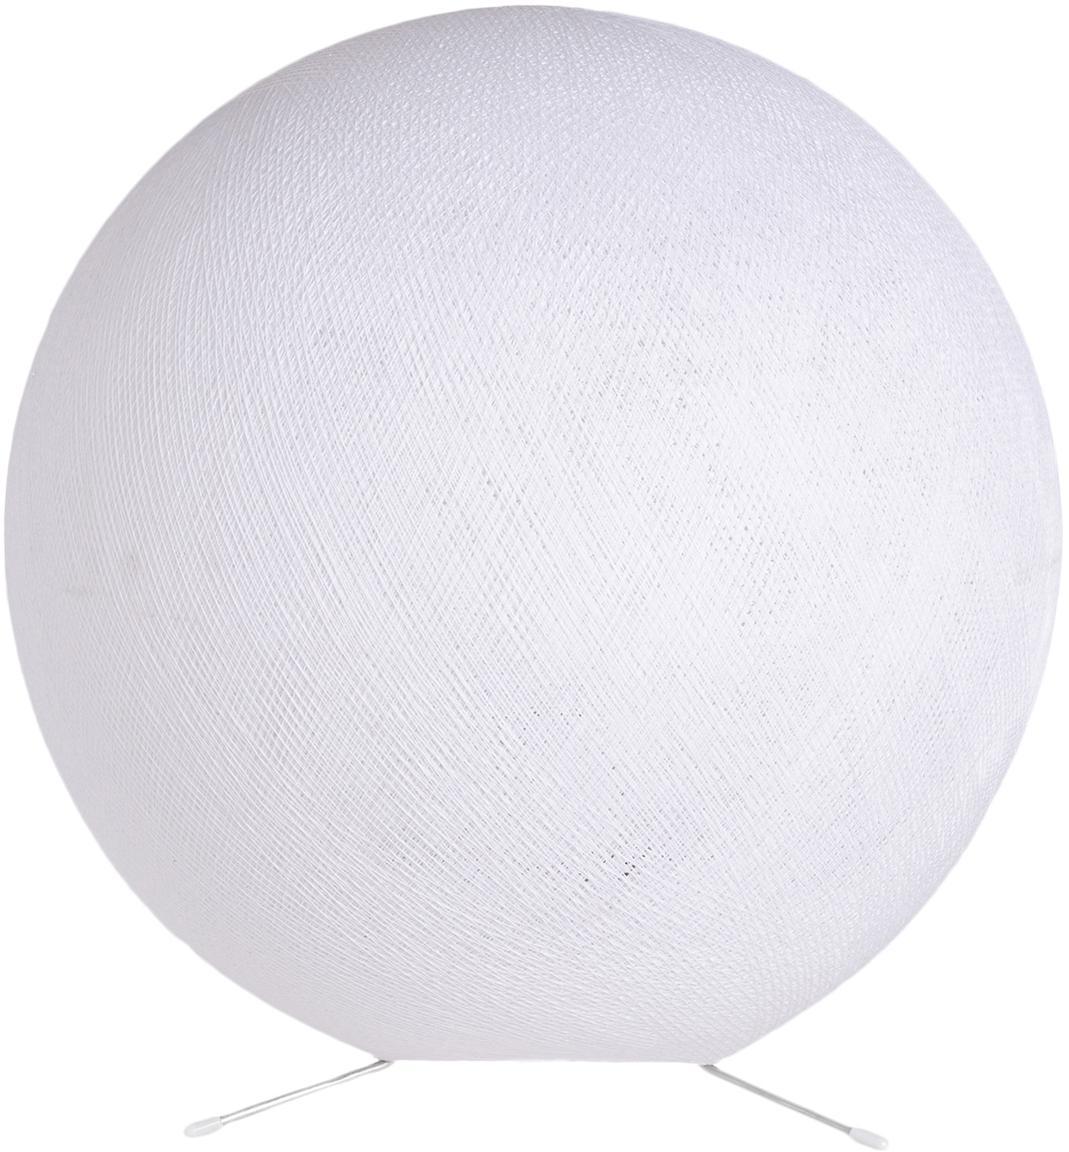 DIY Tischlampe Colorain, Lampenschirm: Polyester, Weiss, Ø 36 cm